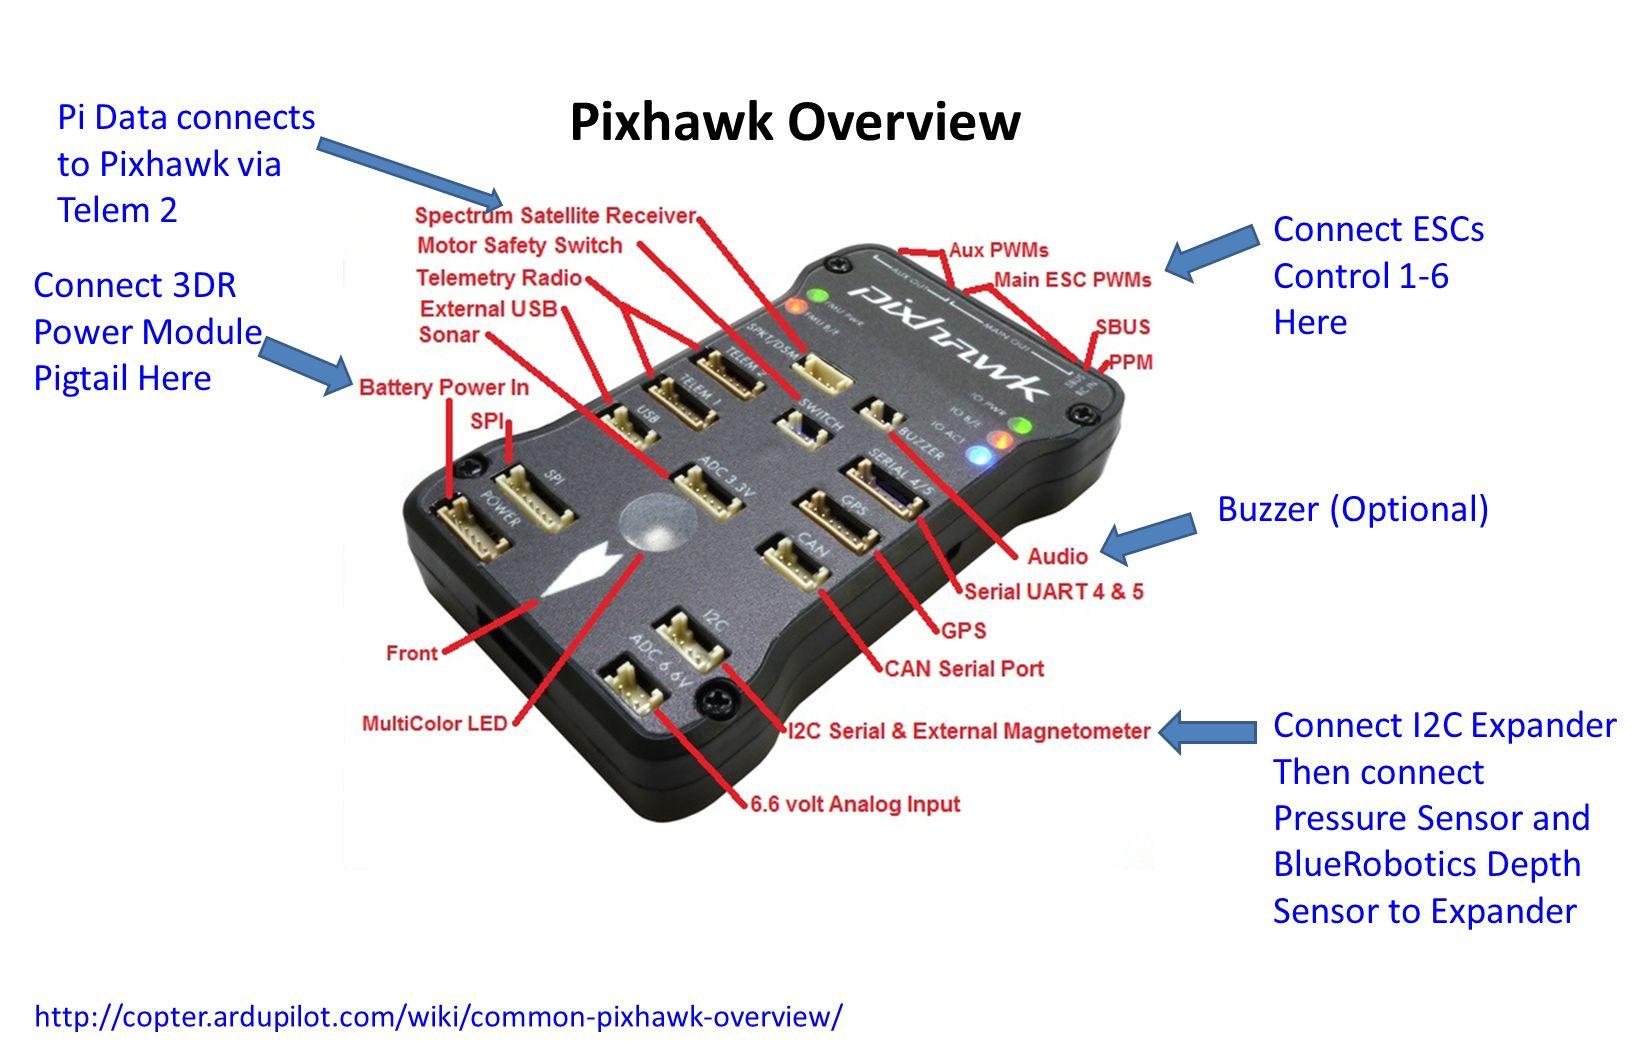 Pixhawk+Overview+Pi+Data+connects+to+Pixhawk+via+Telem+2 bluerov electronics and controls documentation ppt video online Pixhawk Mini Wiring-Diagram at virtualis.co